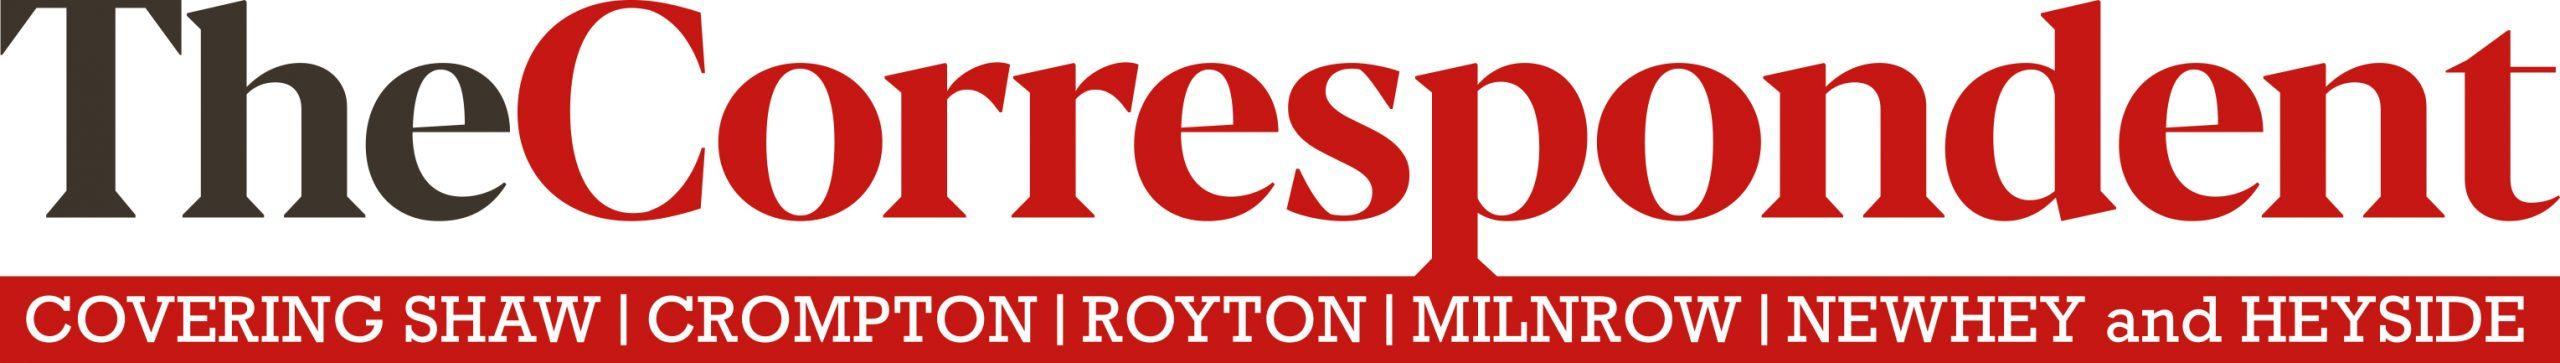 Shaw, Crompton and Royton Correspondent